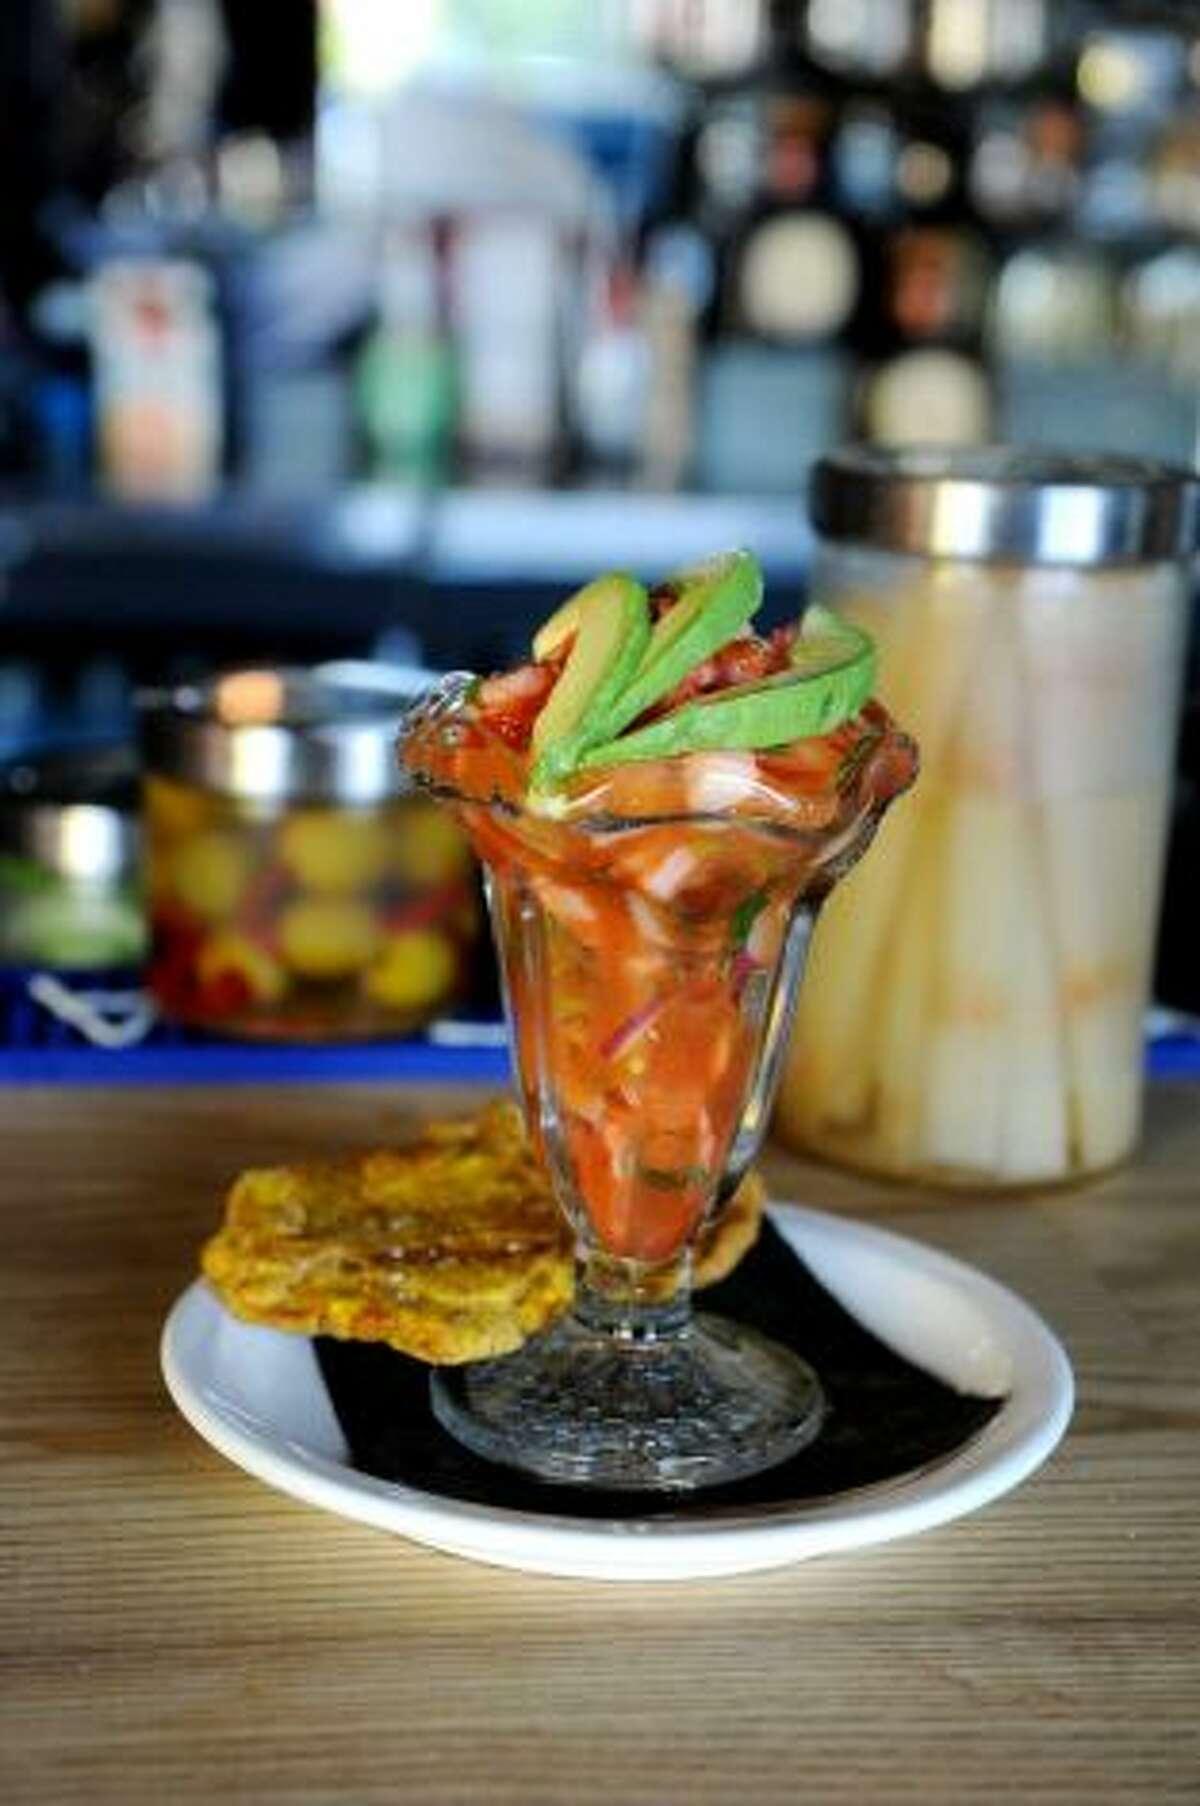 Ceviche: shrimp and scallop with sliced avocado and testones at Valencia Luncheria in Norwalk.